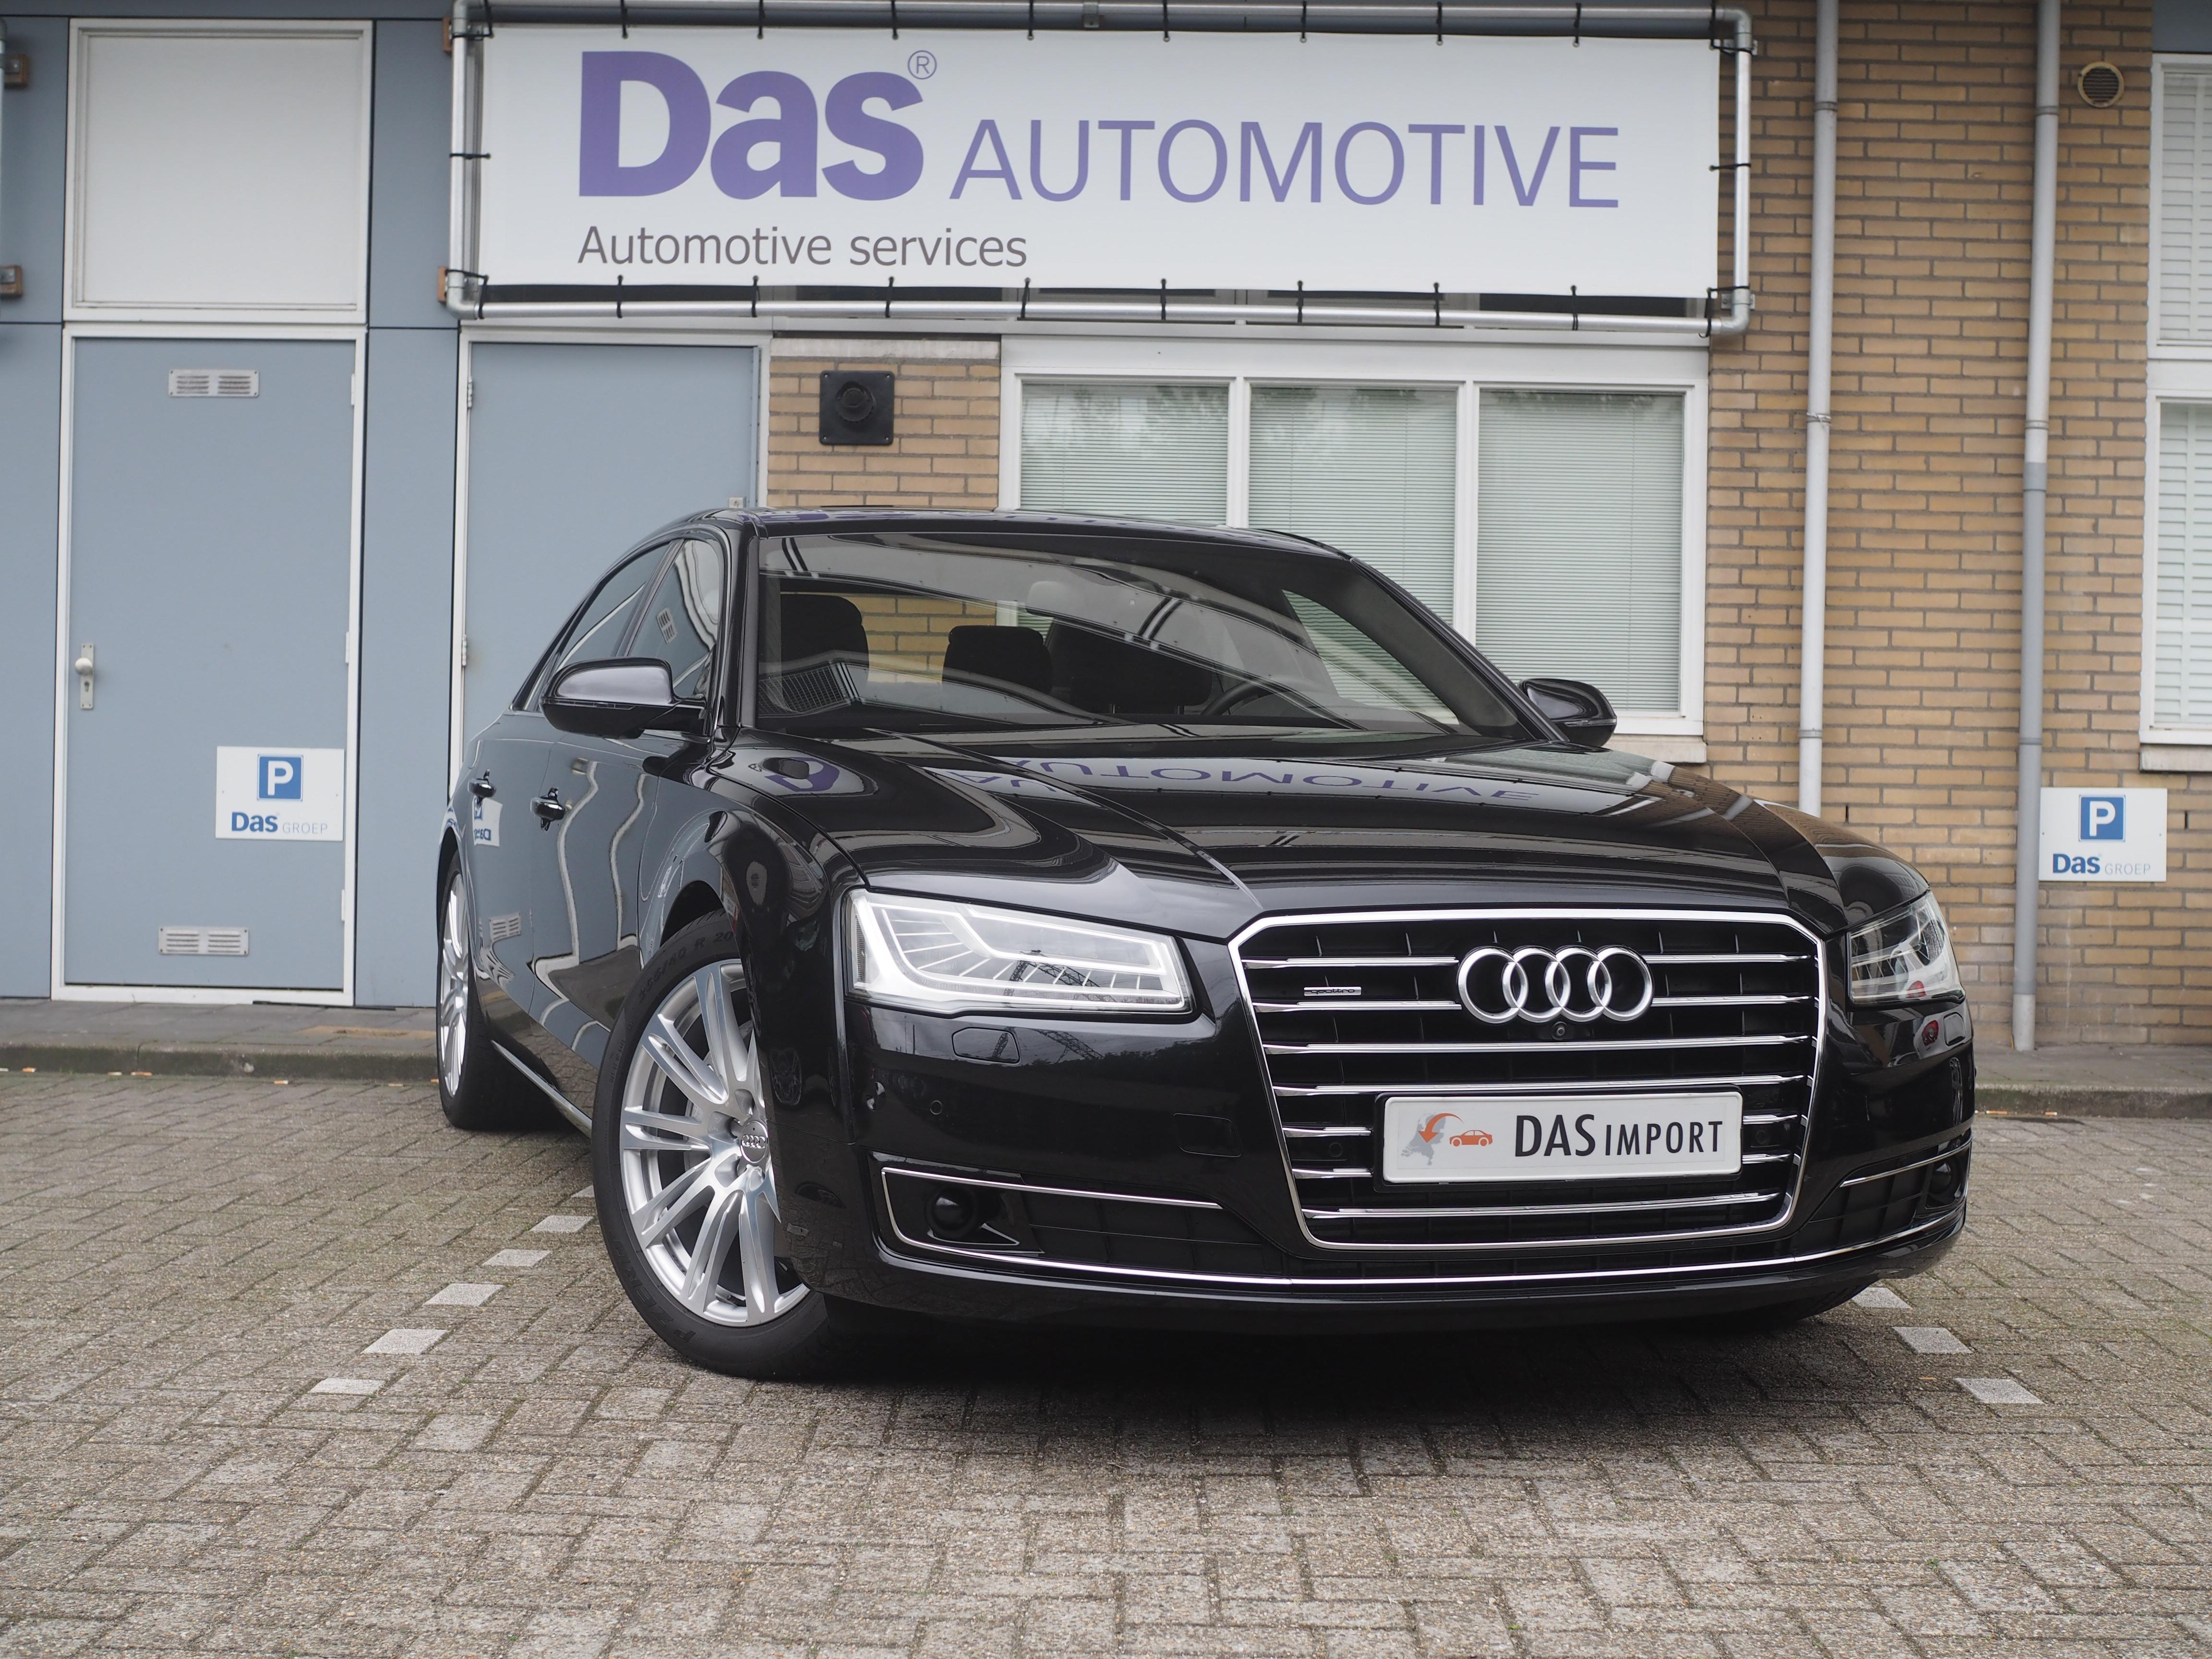 Importauto: Audi A8 Diesel 3.0 TDI clean diesel quattro Lang 6/2014